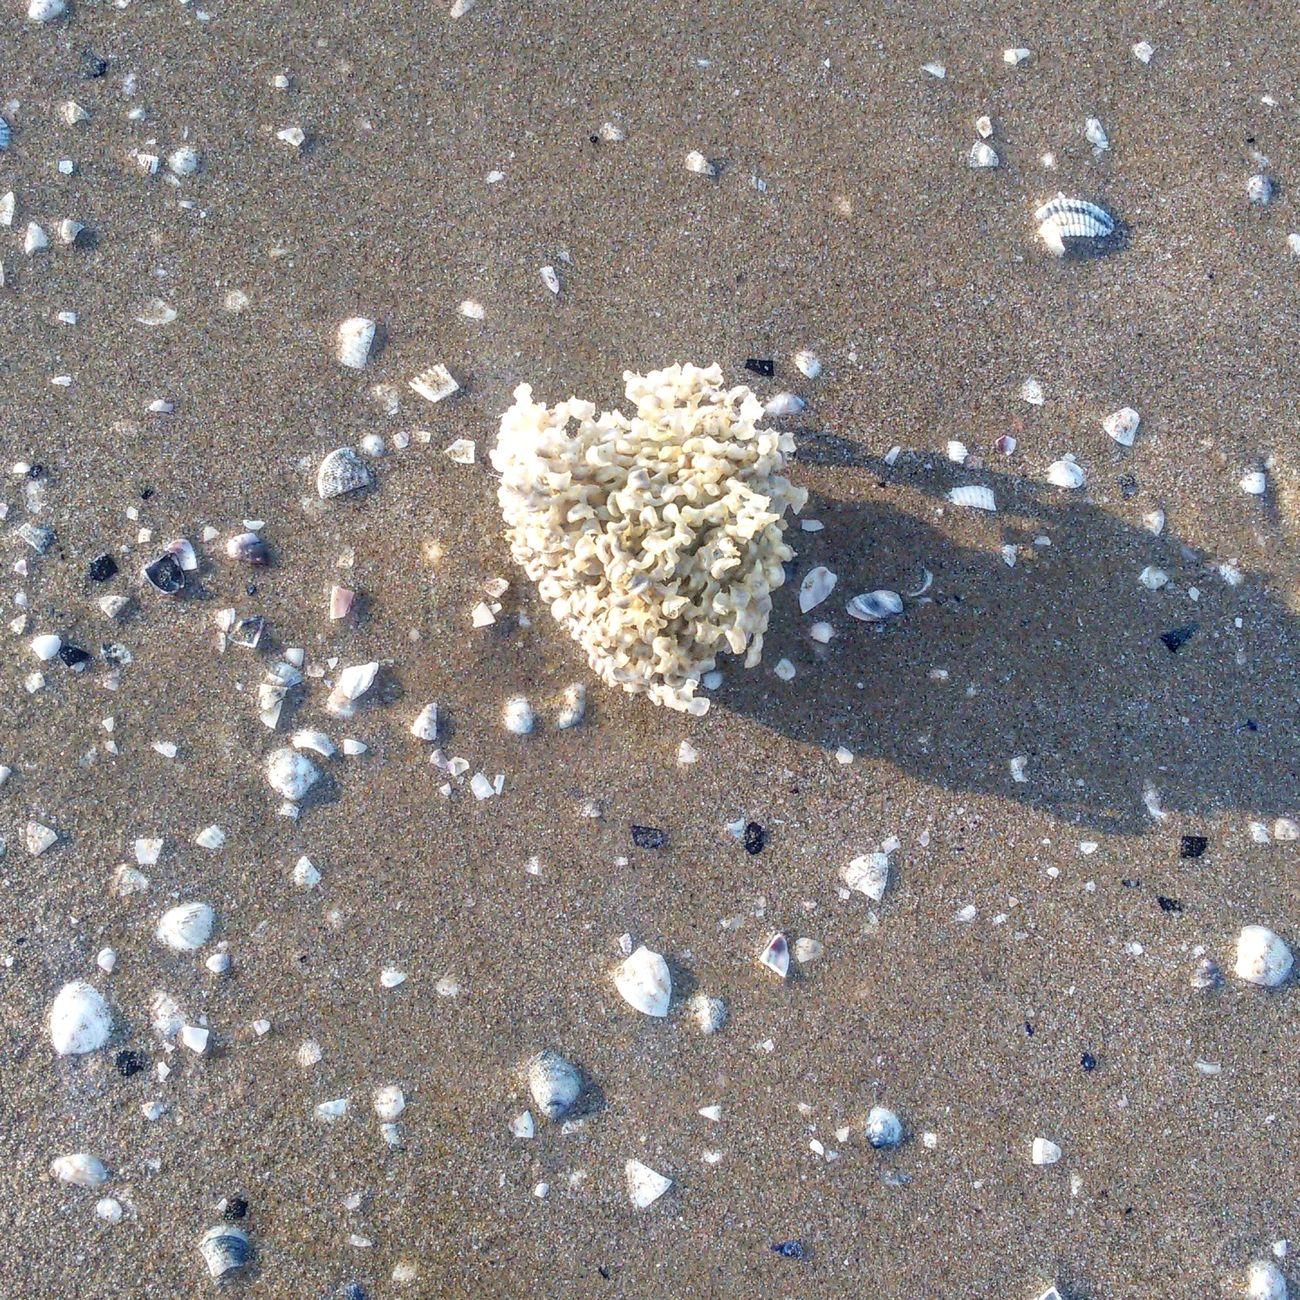 Spugna Mare ❤ Photography Illuminated Enjoyment Likes4likes Riminibeach👍😎 Colorful Sand Shell Sun Beach Life Focus Color Explosion Life Is A Beach Following First Eyeem Photo Sunnydays Sunset Water